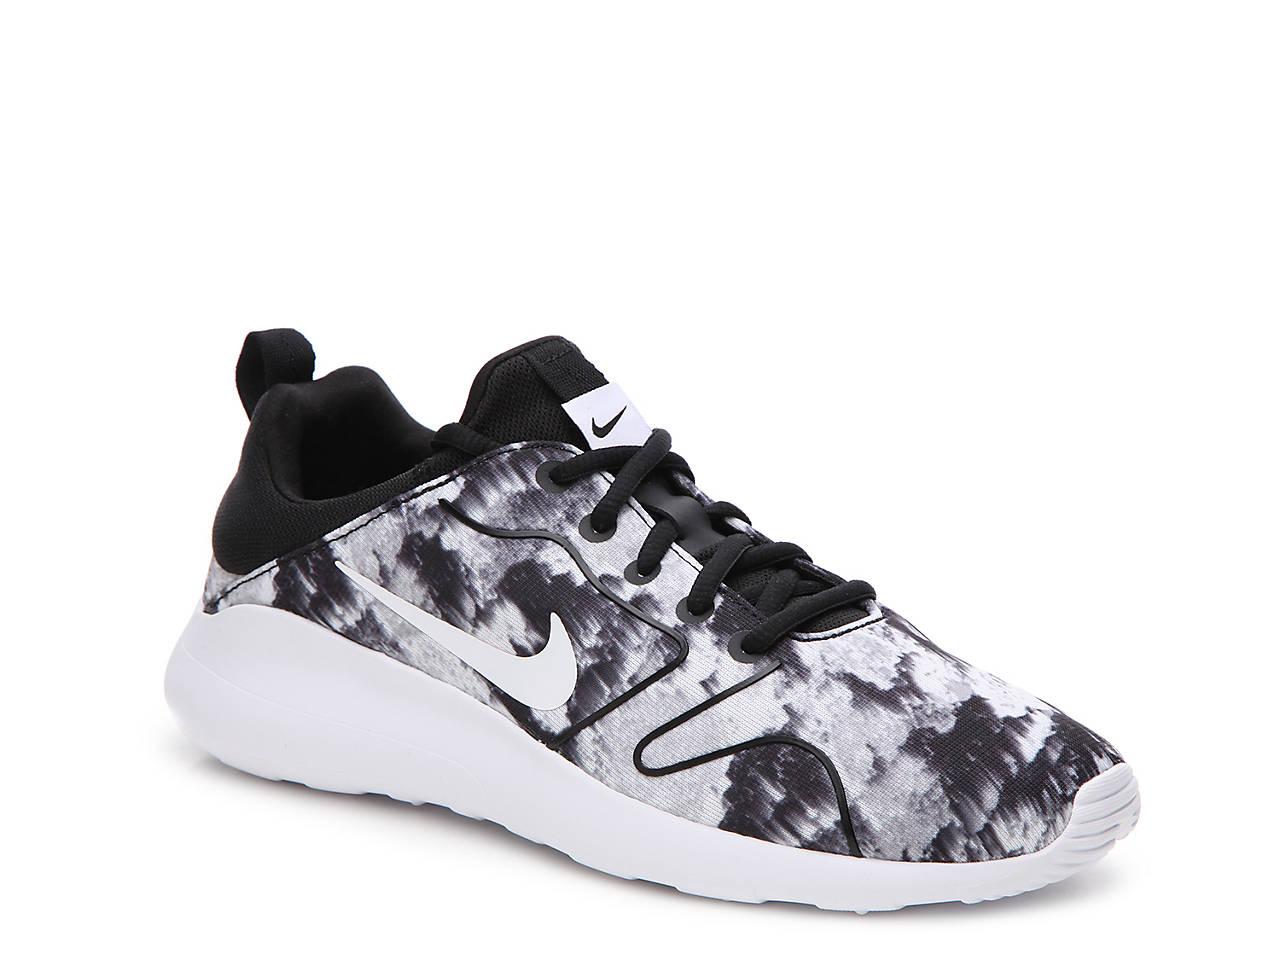 size 40 2bcc7 bd66b Nike. Kaishi 2 Print ...